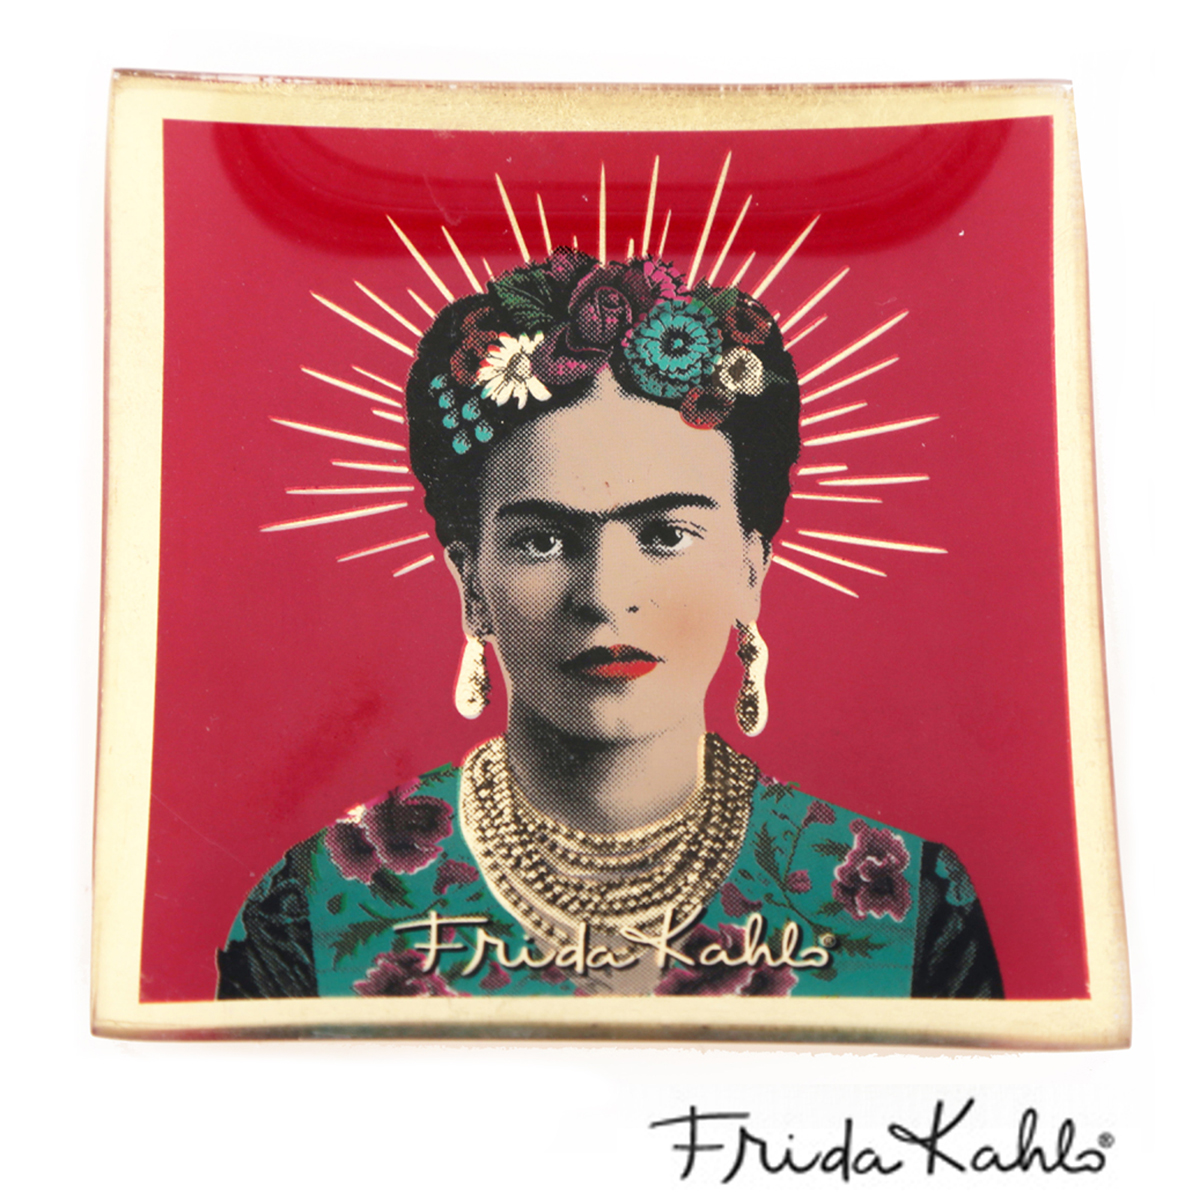 Coupelle vide poches verre \'Frida Kahlo\' rose - 10x10 cm - [A0032]